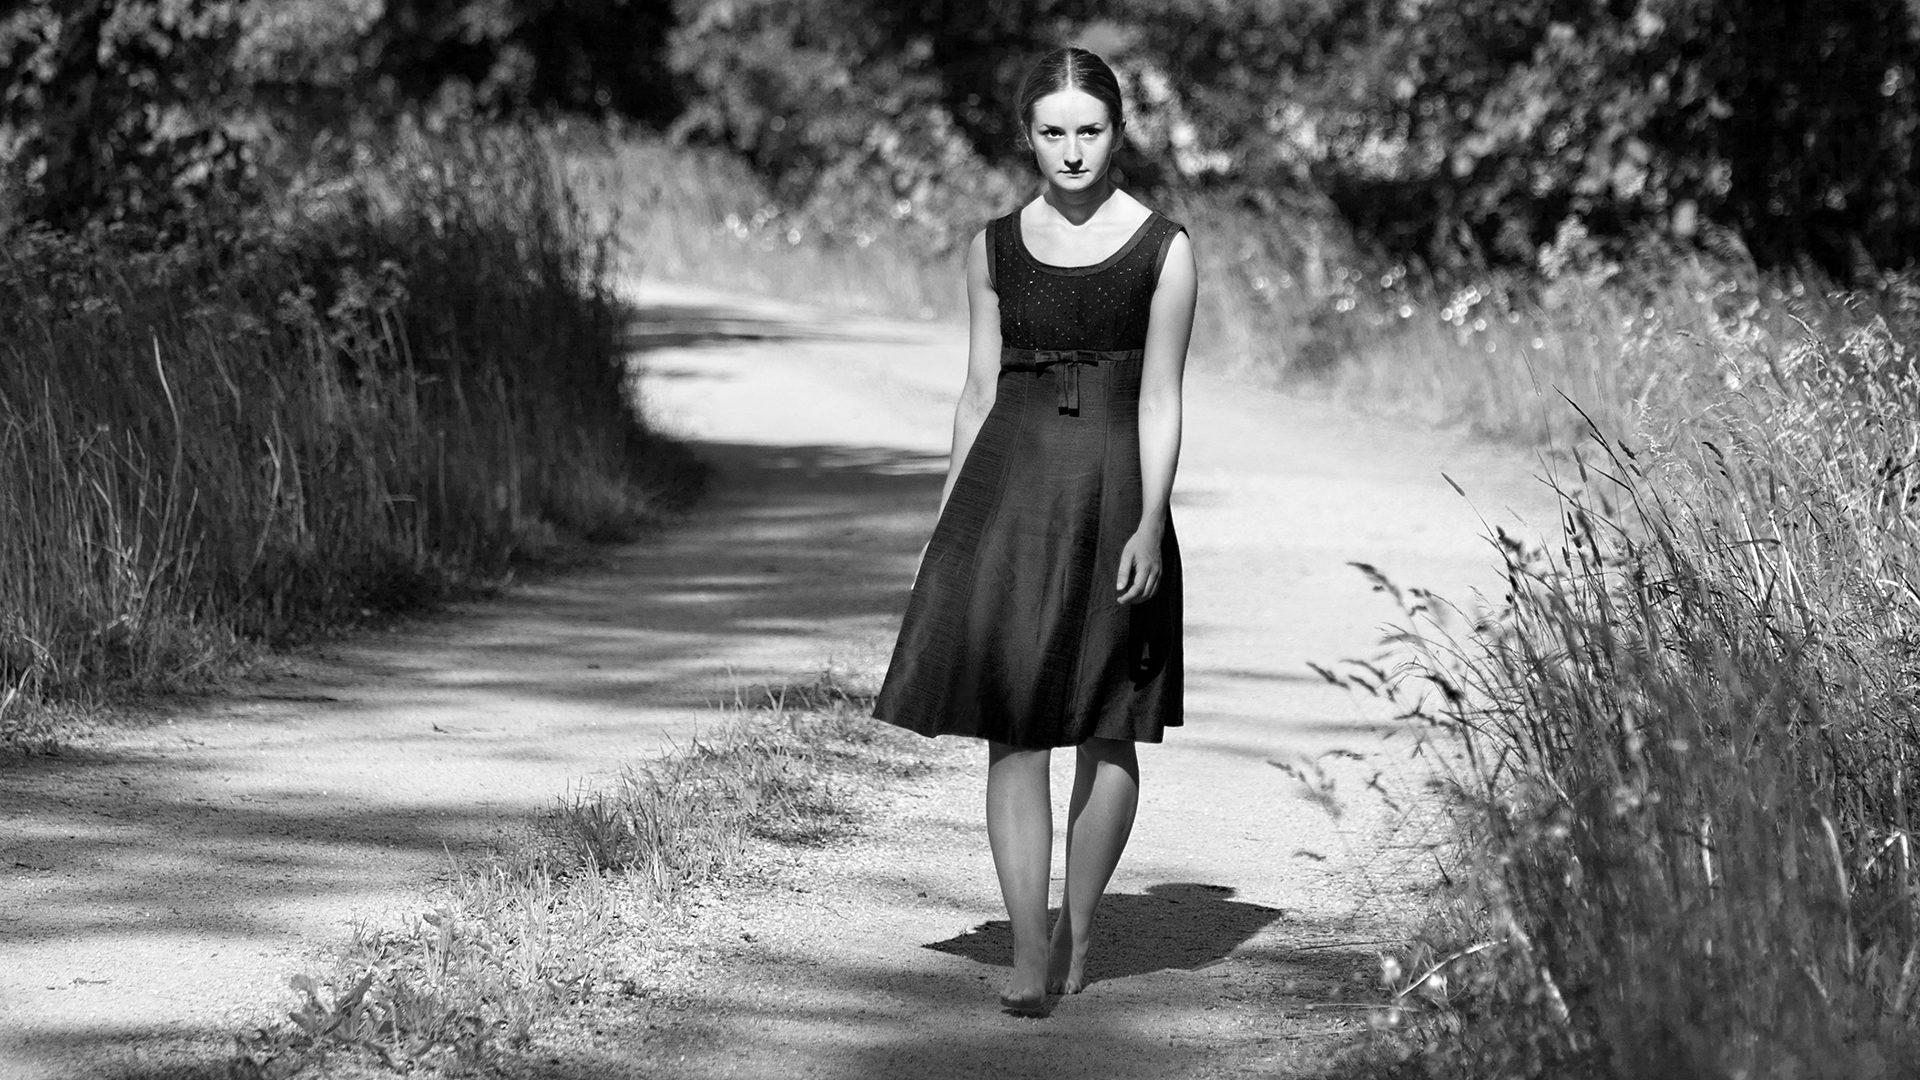 Fotografen Carina Vallin